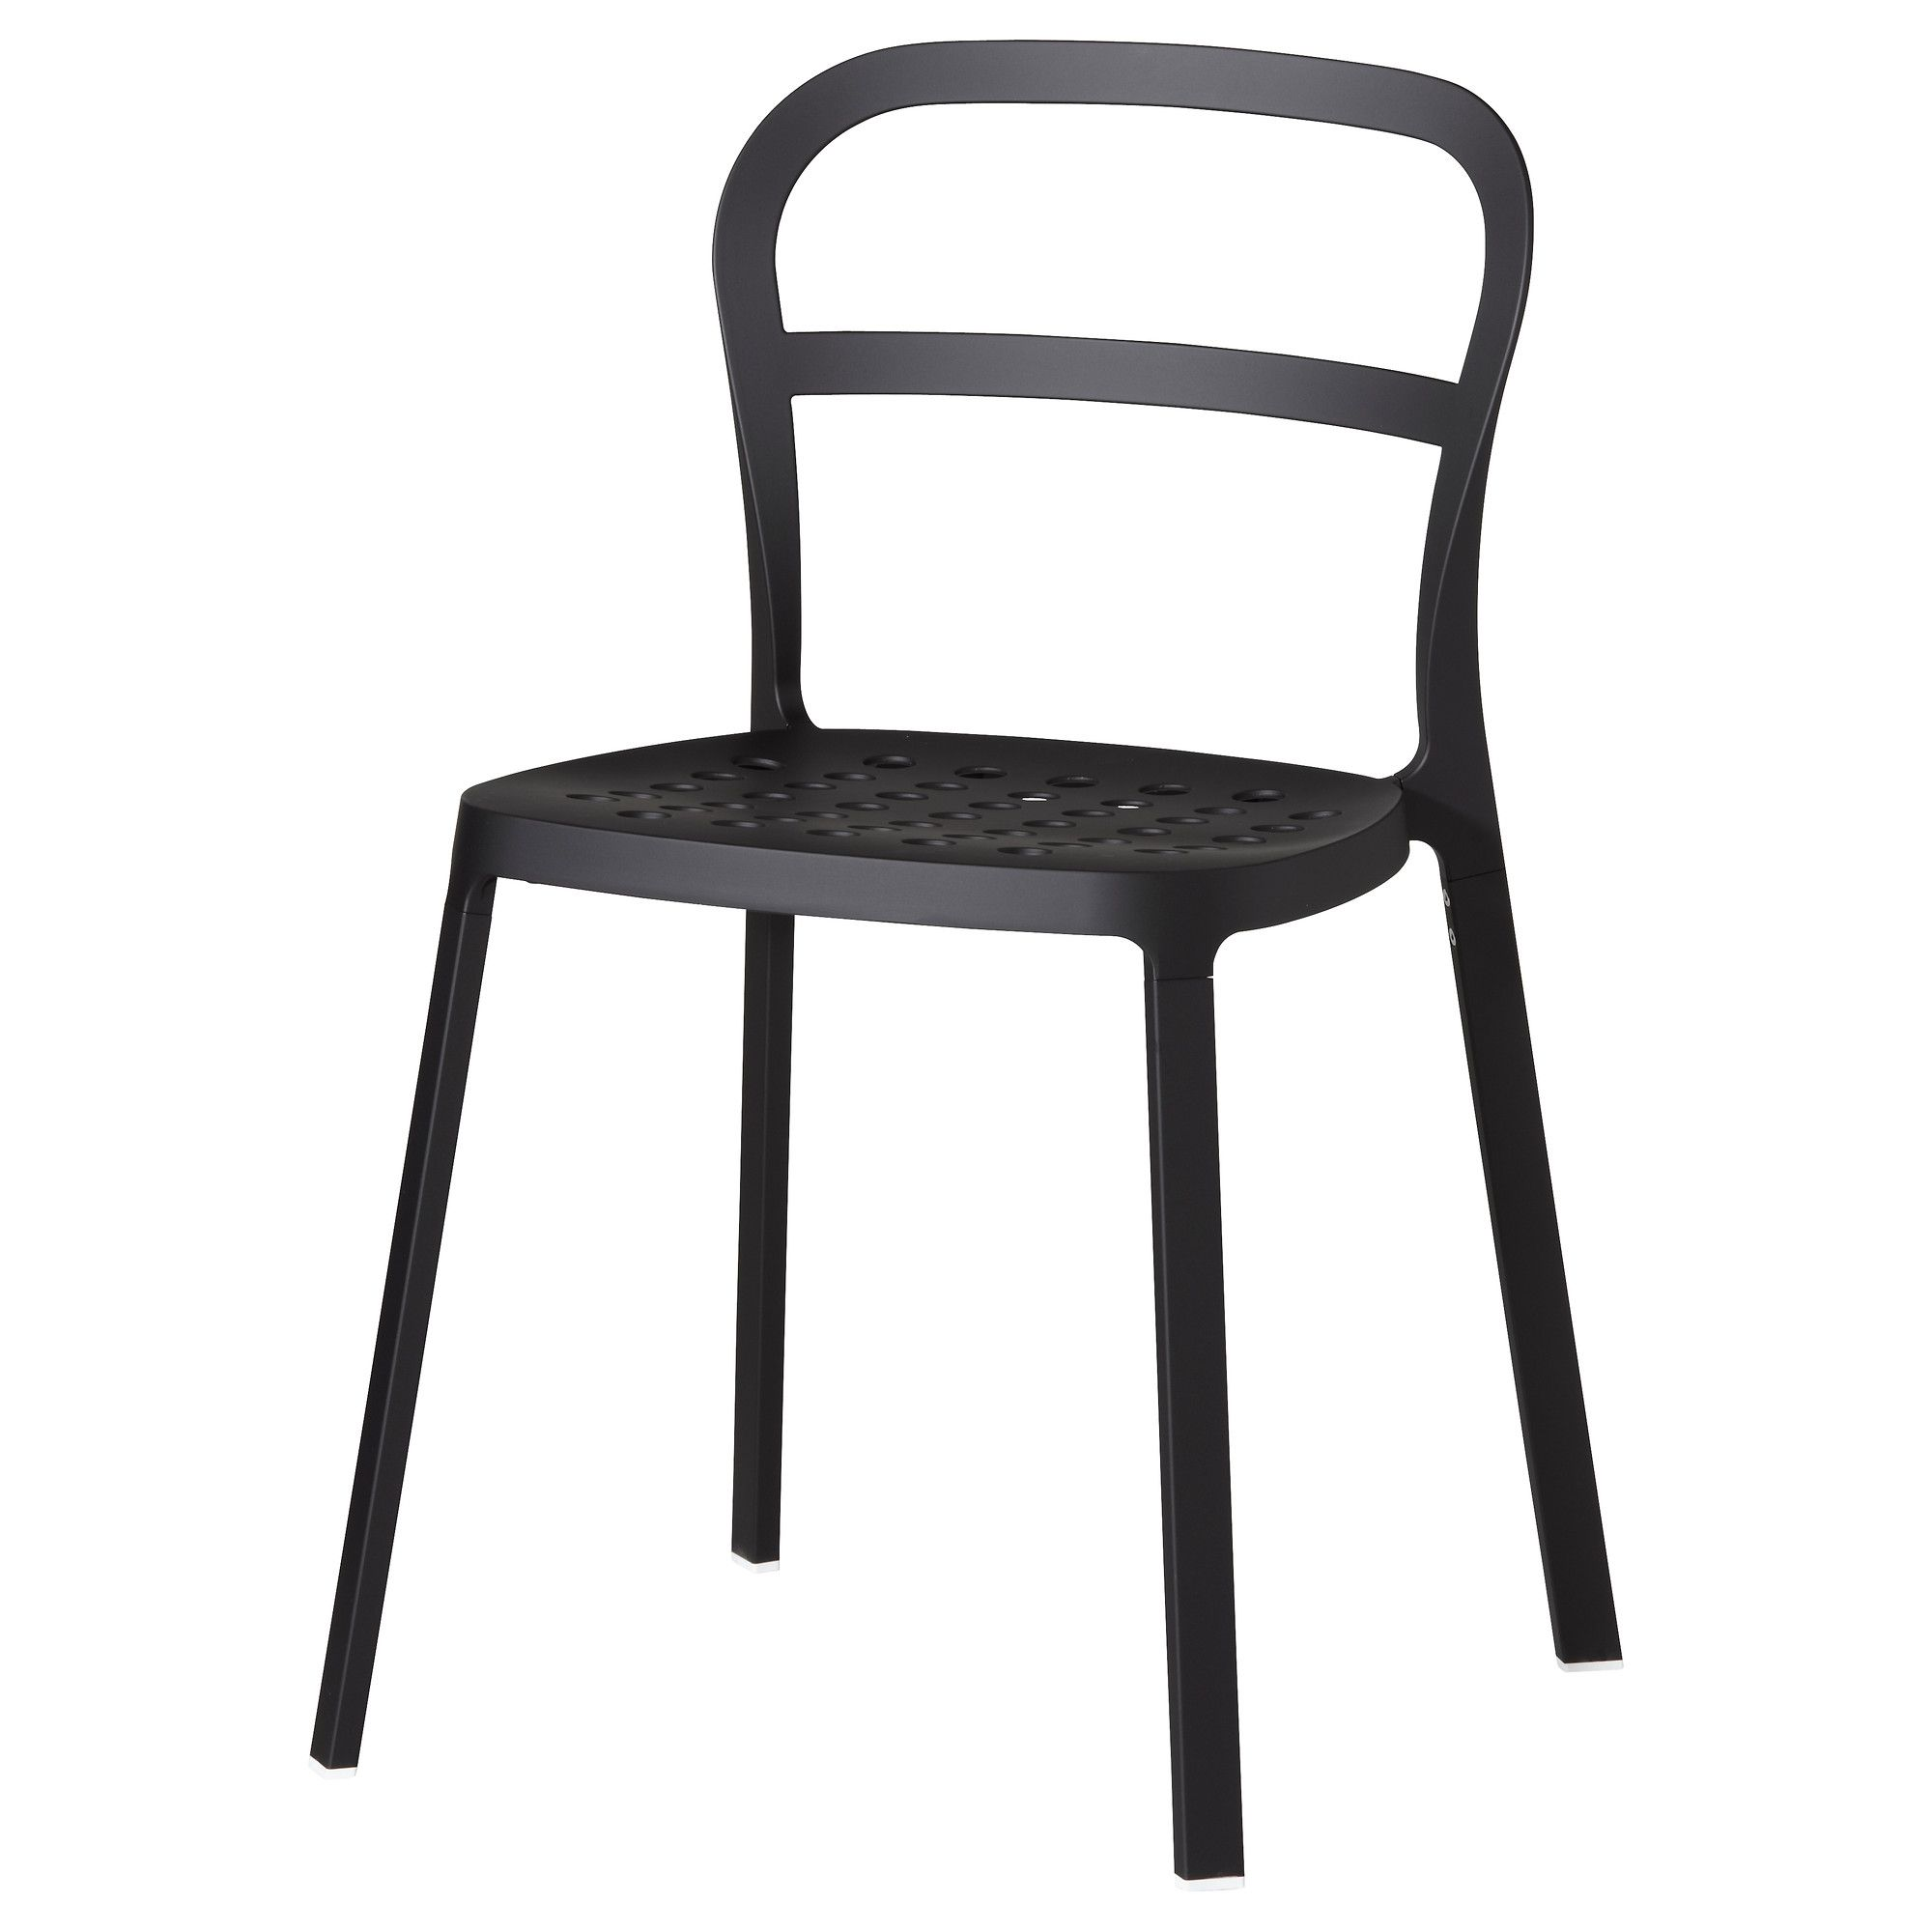 chaise plastique ikea great chaise plastique ikea amazing. Black Bedroom Furniture Sets. Home Design Ideas